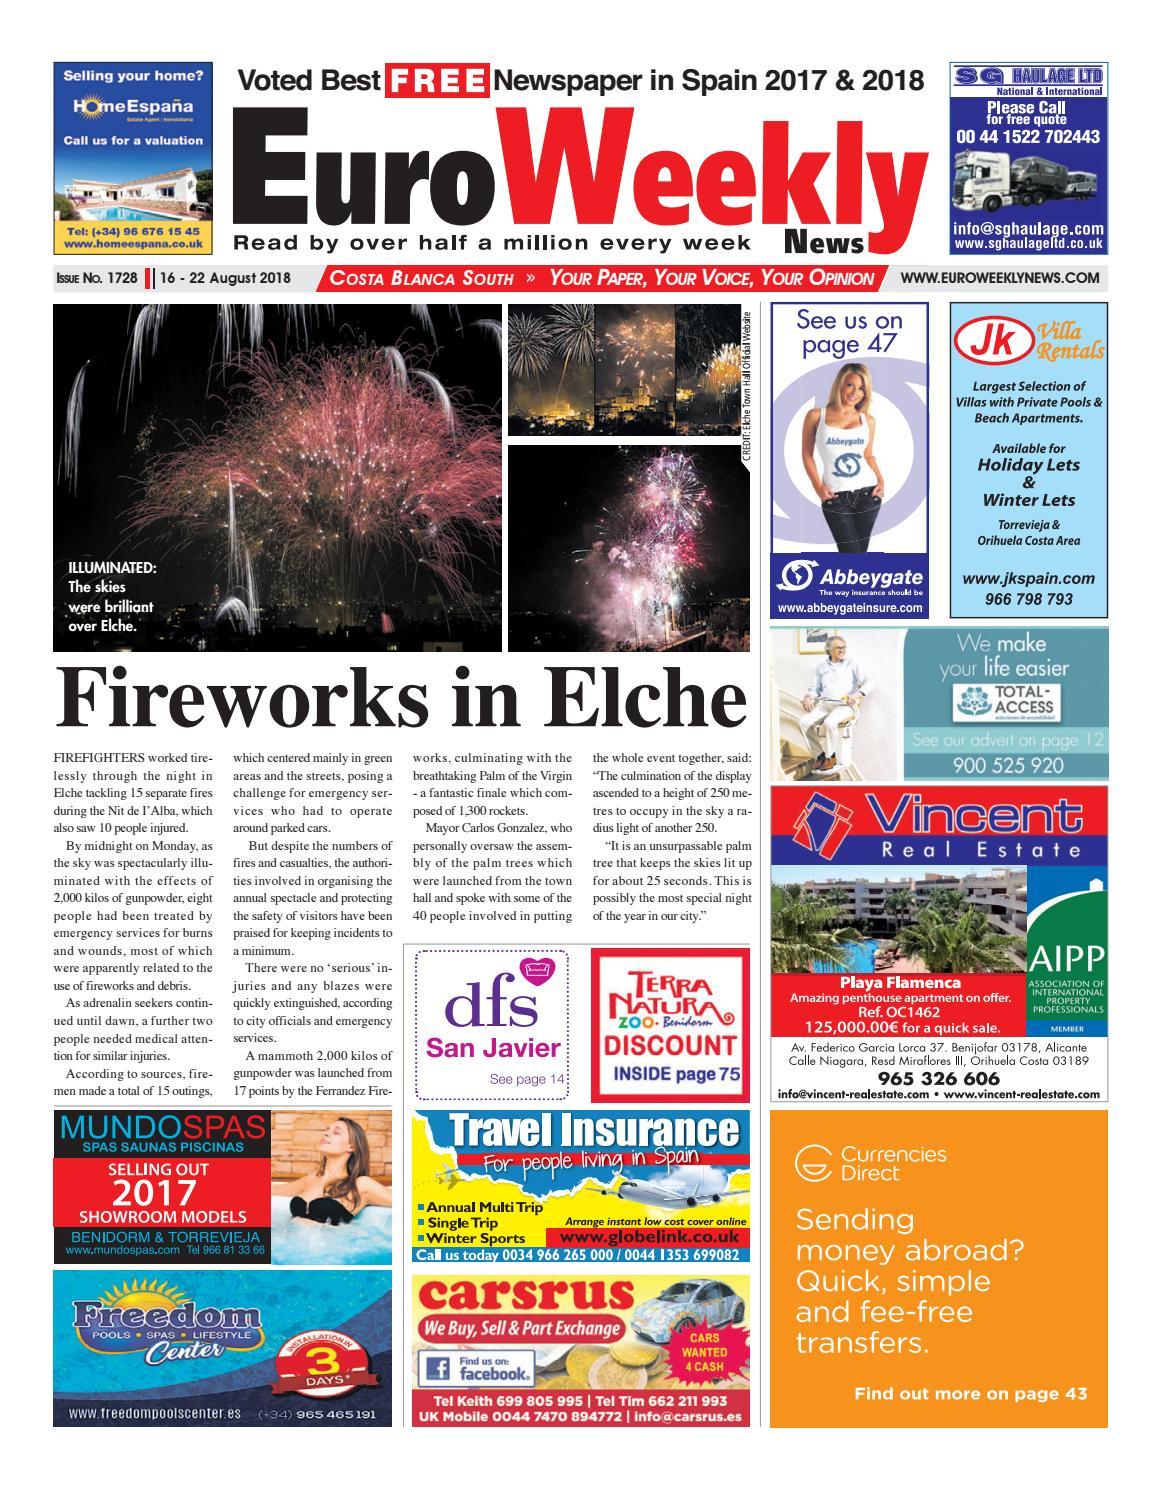 Nuria Lewinsky euro weekly news - costa blanca south 16 - 22 august 2018